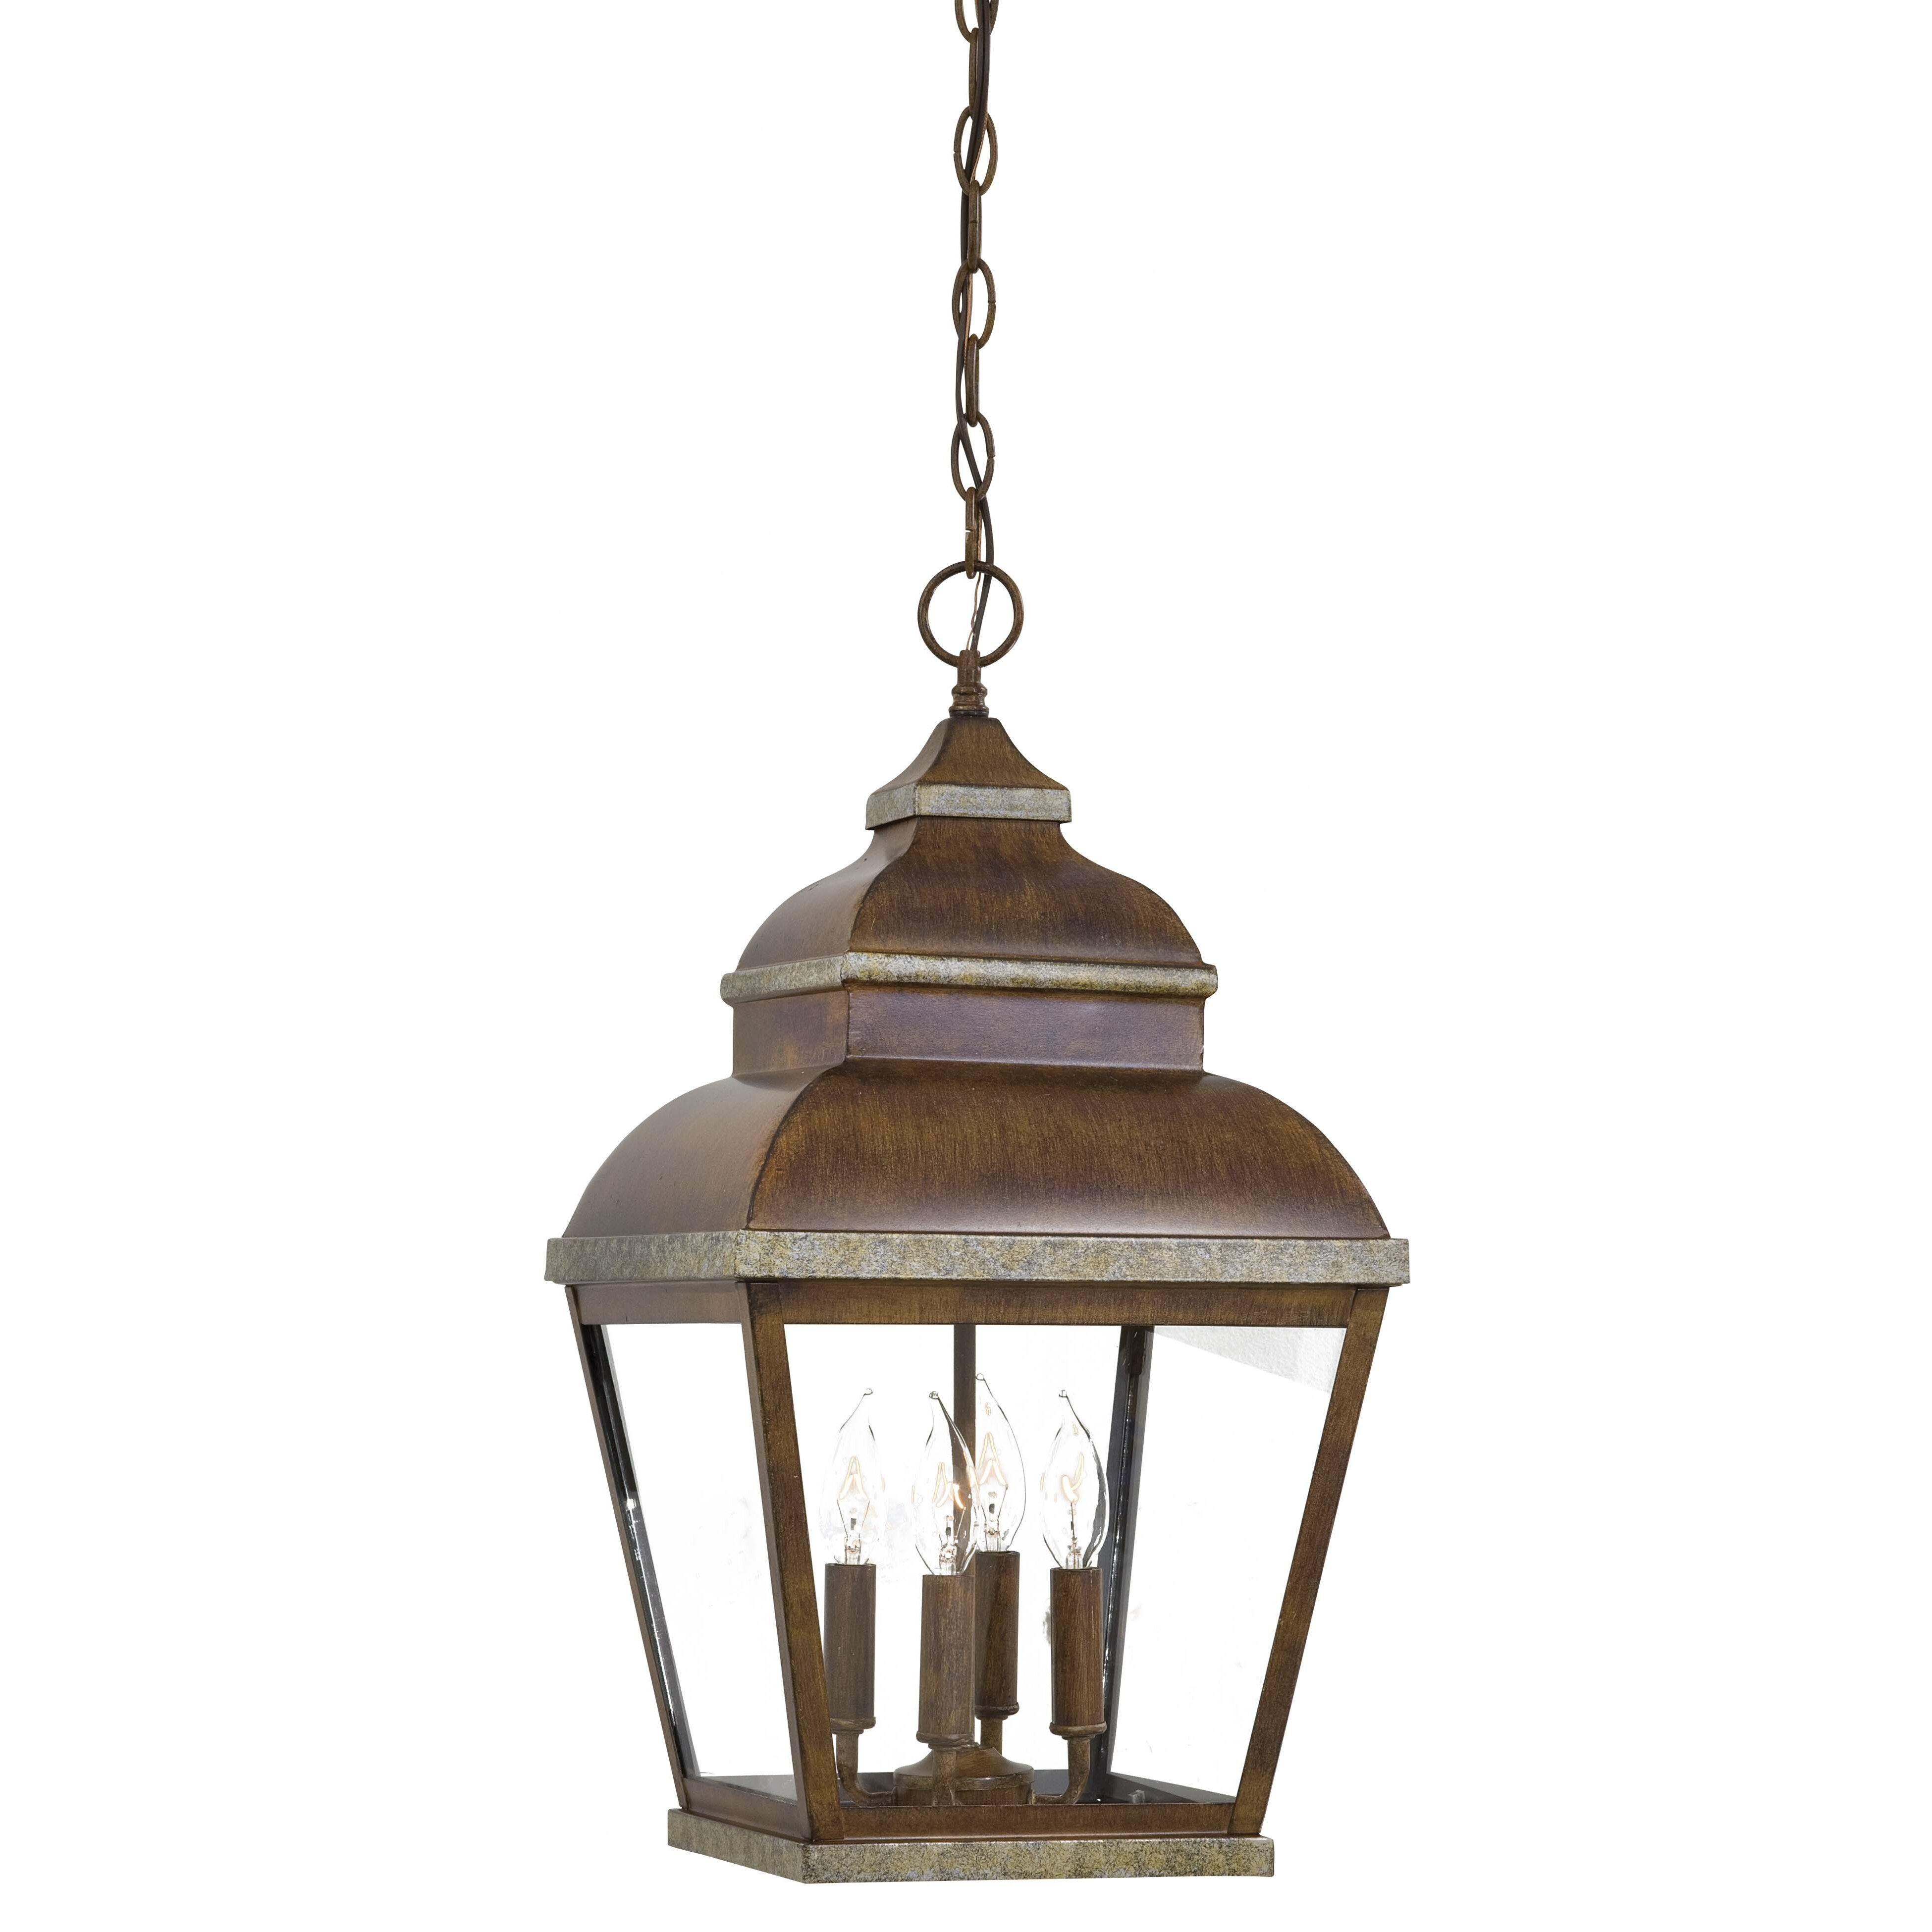 Wayfair Outdoor Hanging Lights: Great Outdoors By Minka Mossoro 4 Light Outdoor Hanging